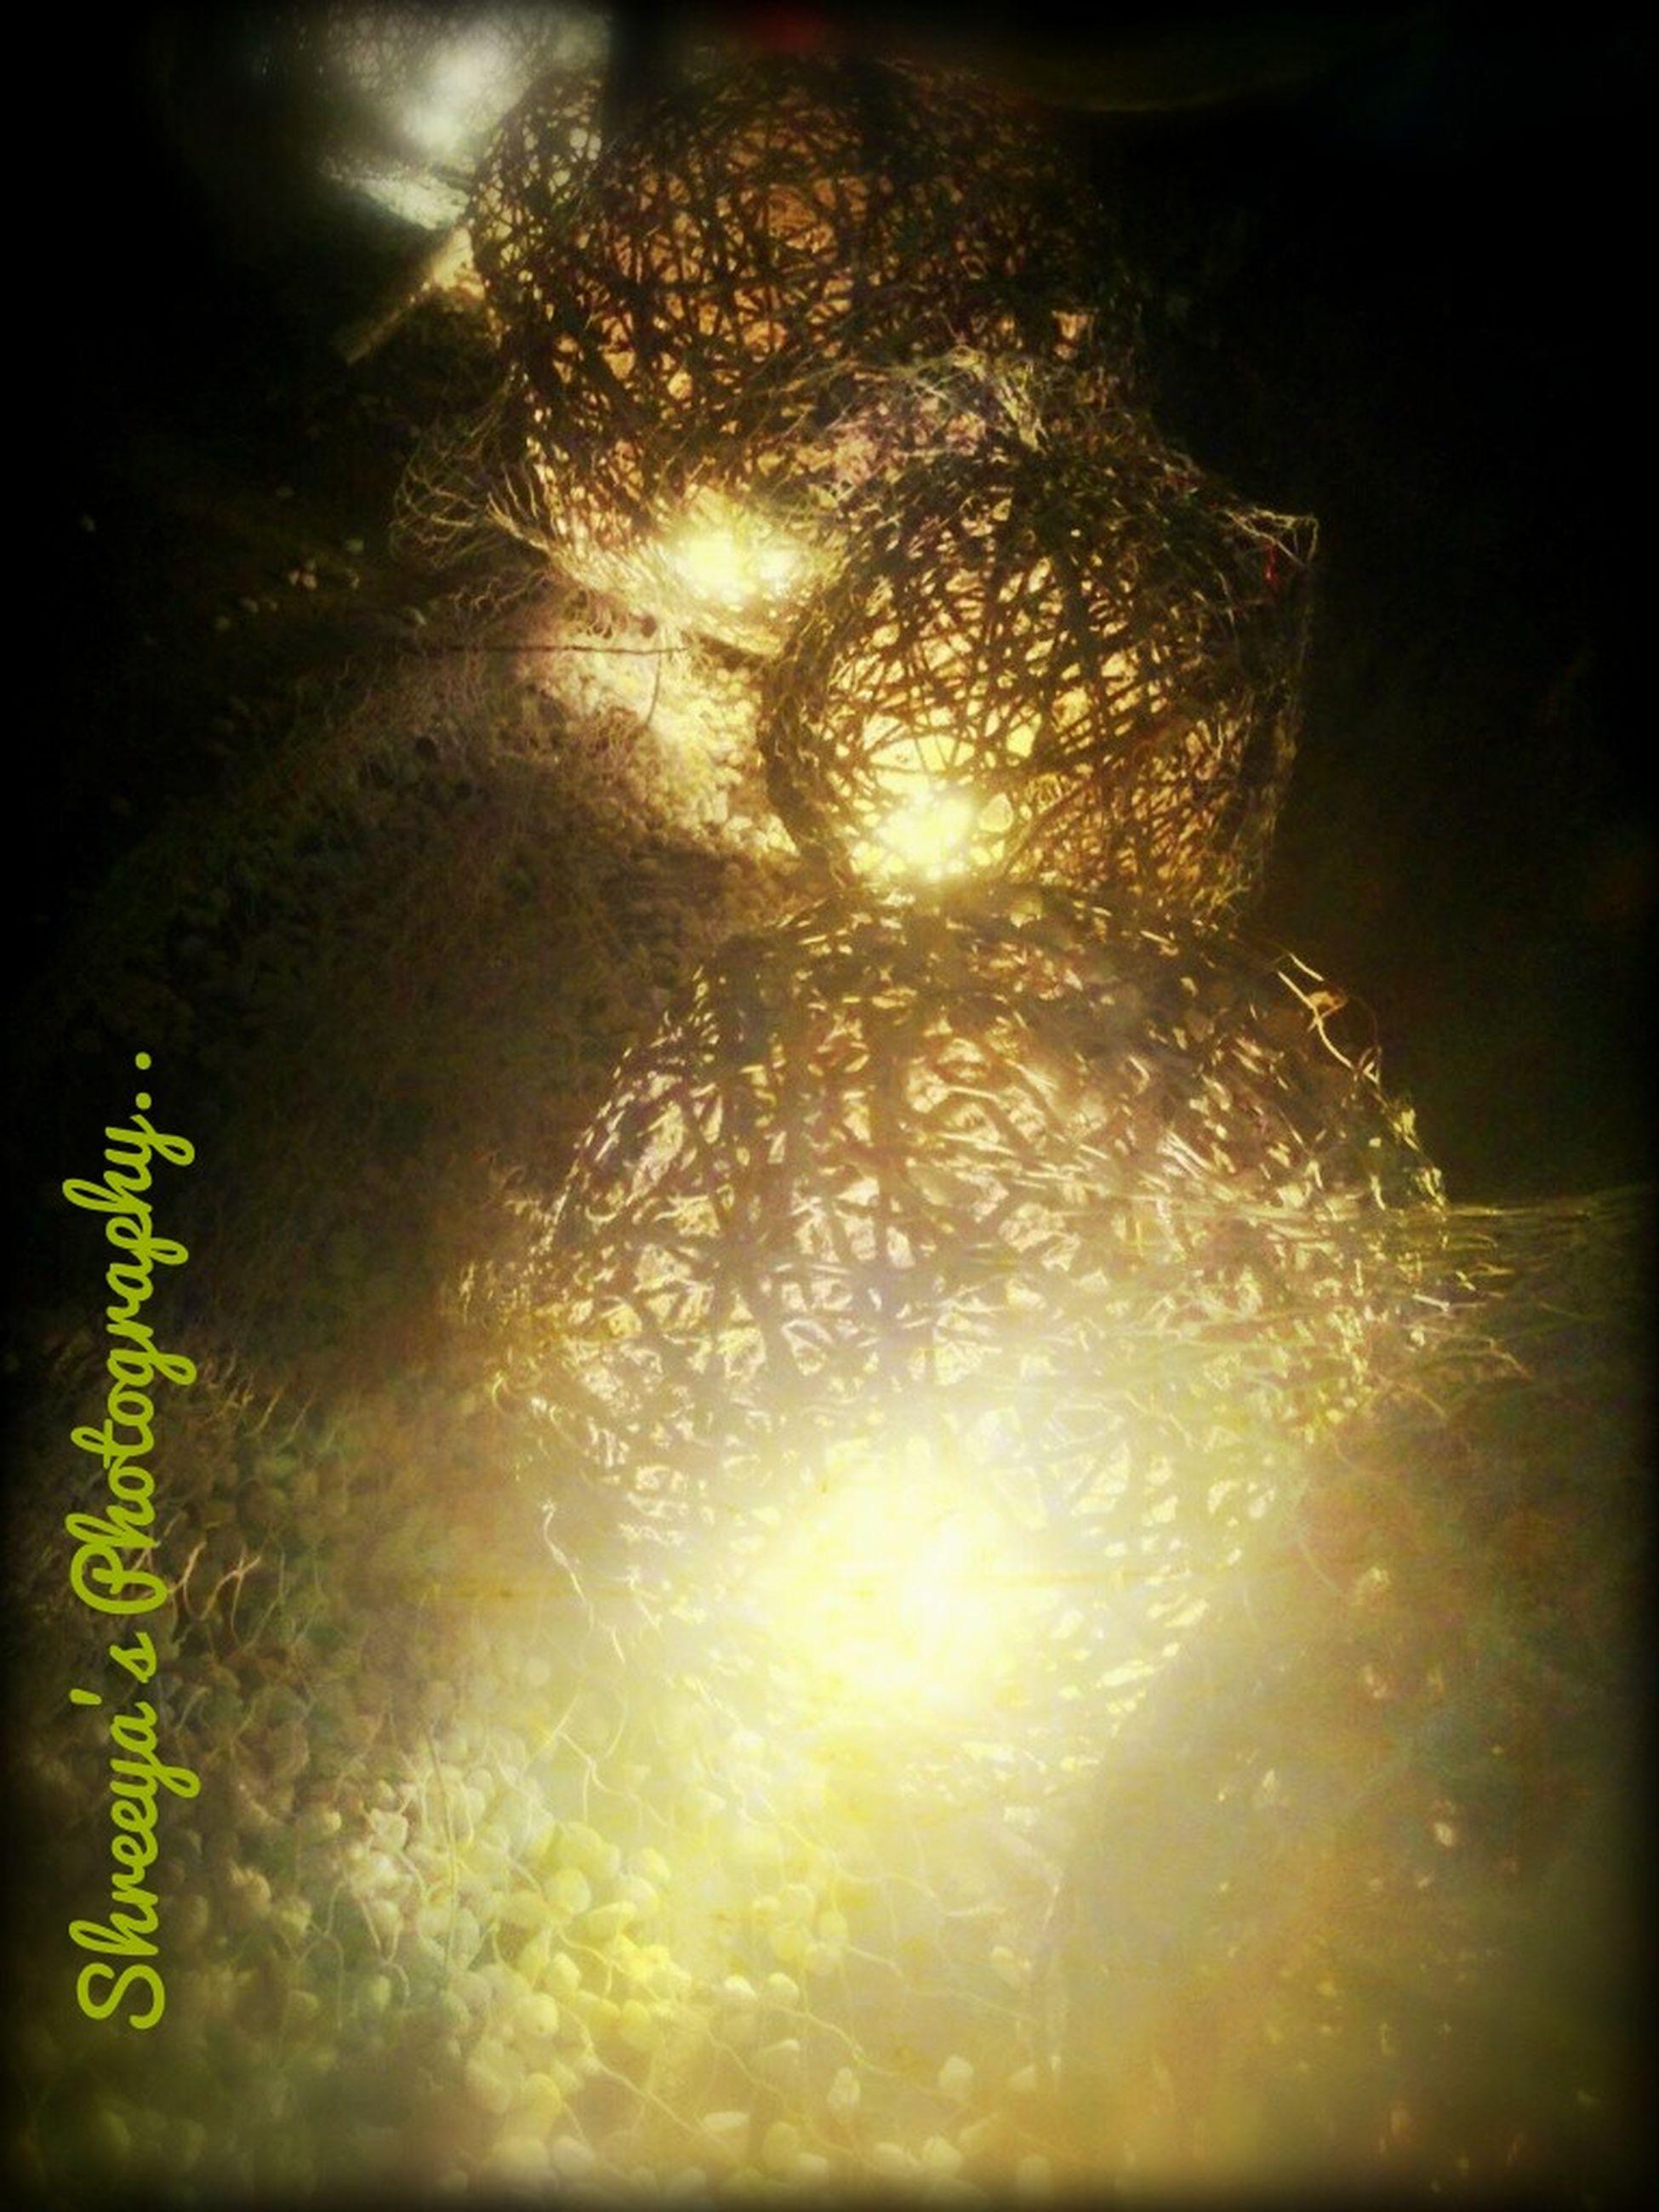 illuminated, night, glowing, lighting equipment, light - natural phenomenon, decoration, light, reflection, indoors, lit, pattern, motion, celebration, long exposure, no people, low angle view, water, electricity, dark, firework display